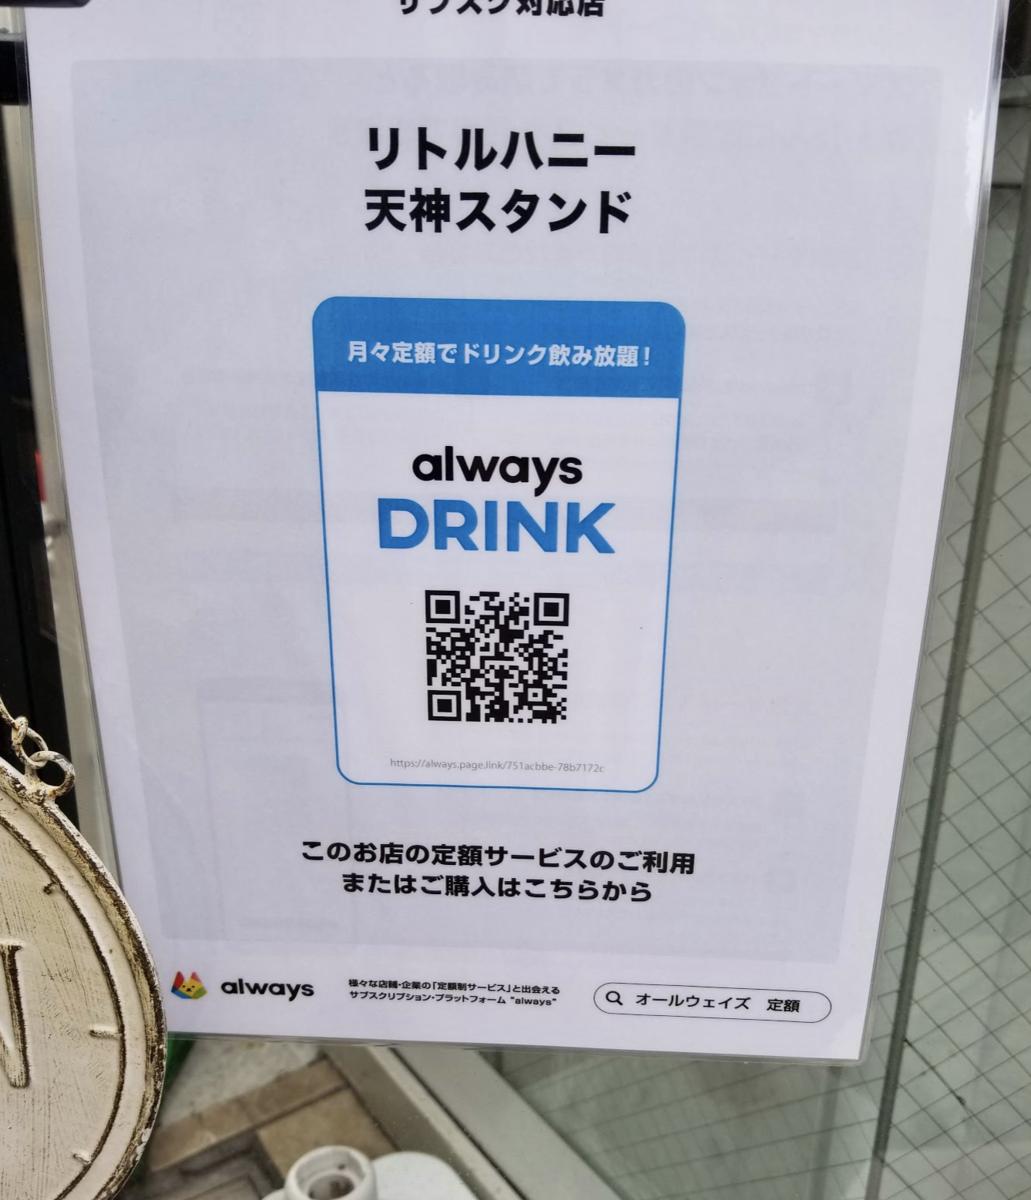 f:id:YusukeIwaki:20191006145417p:plain